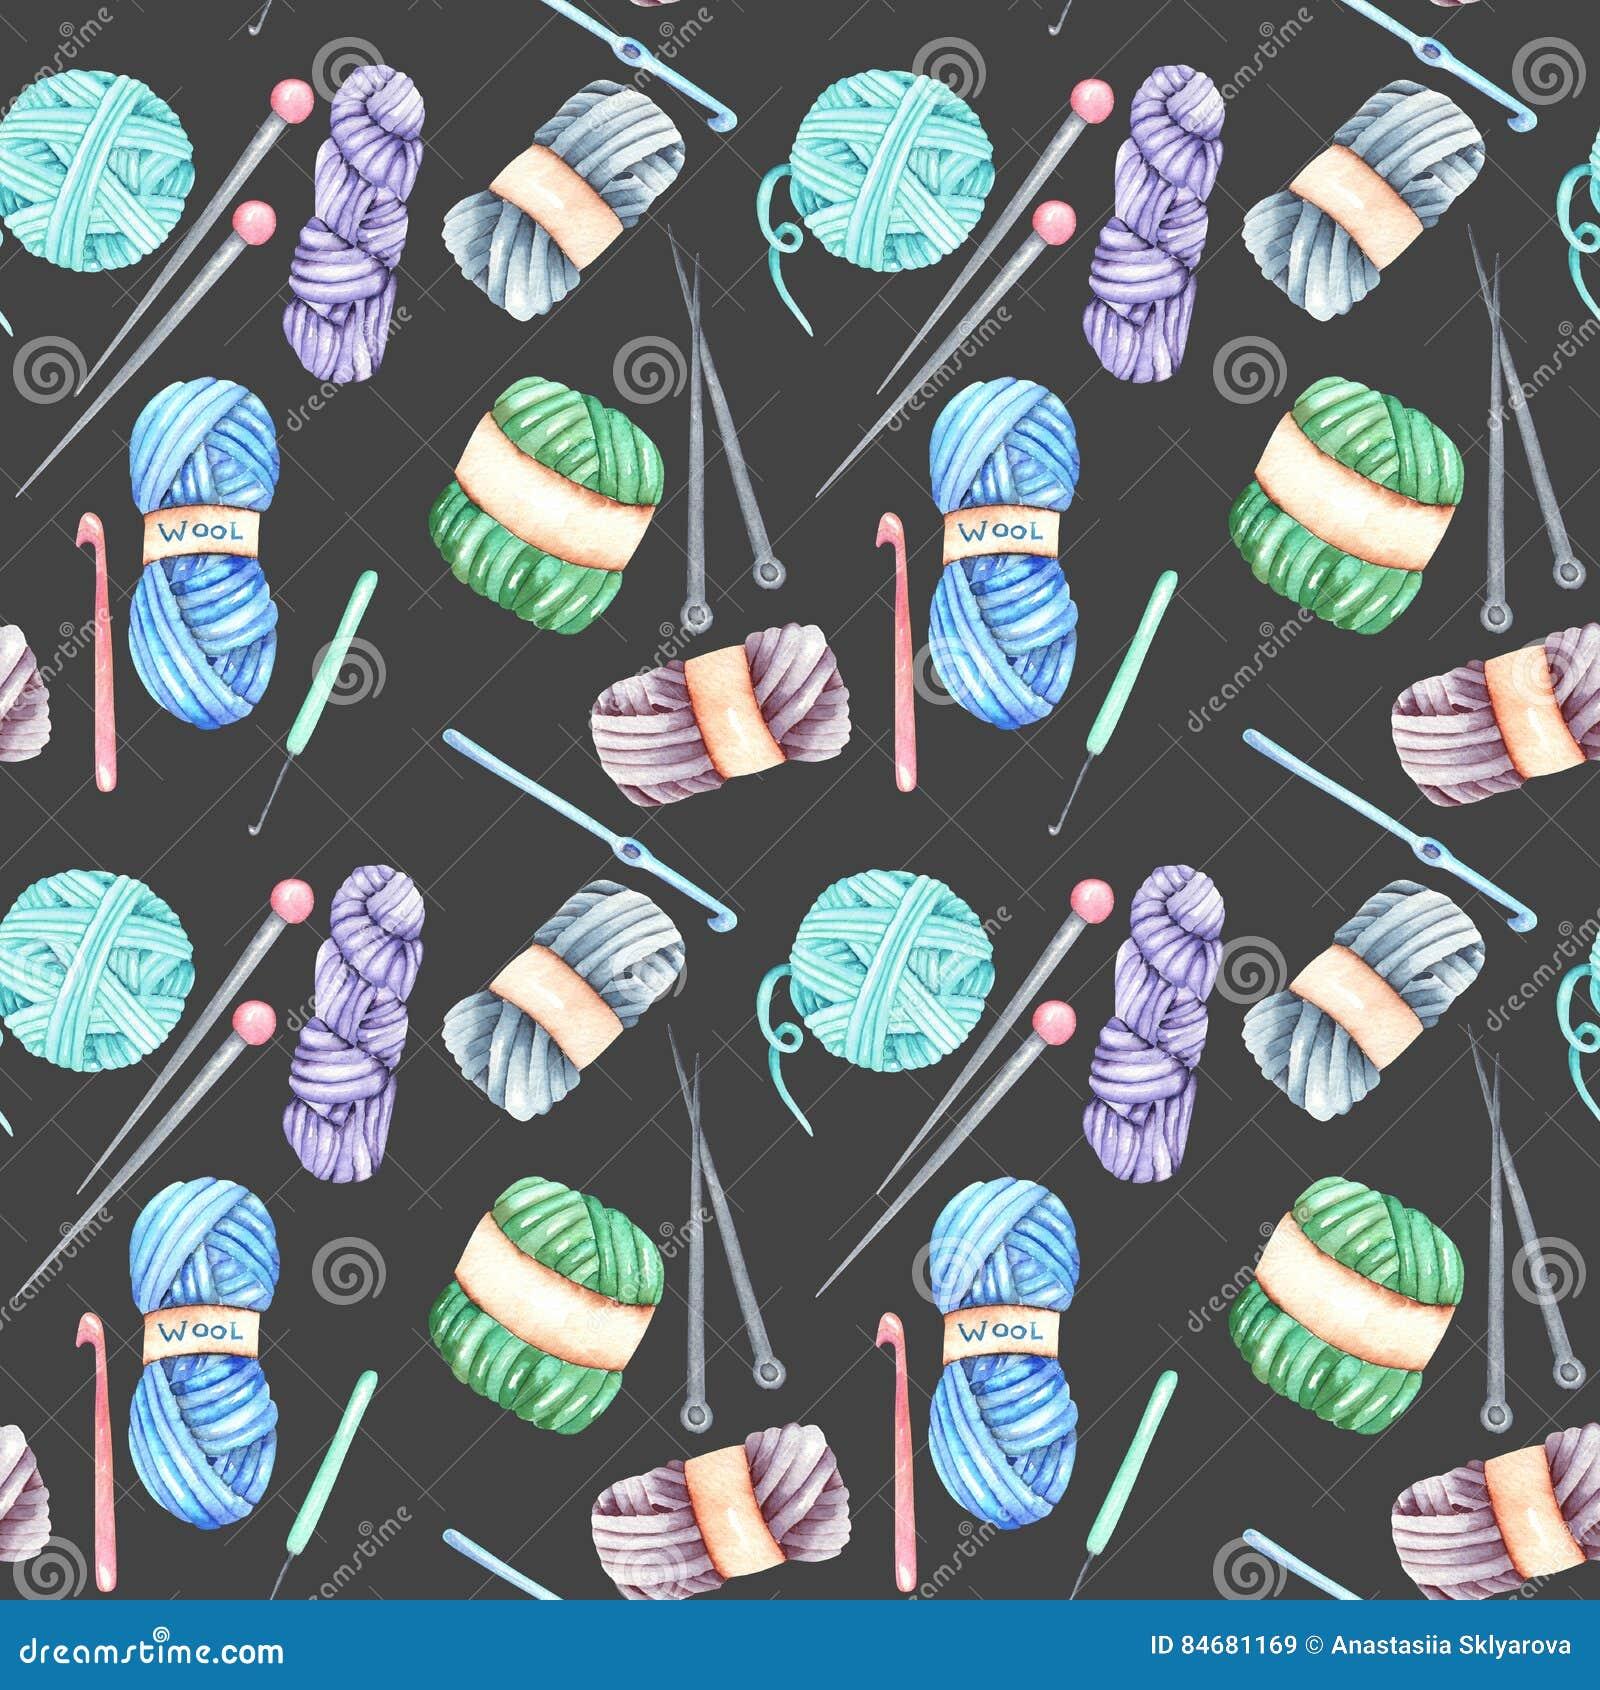 Seamless Pattern With Watercolor Knitting Elements: Yarn, Knitting ...